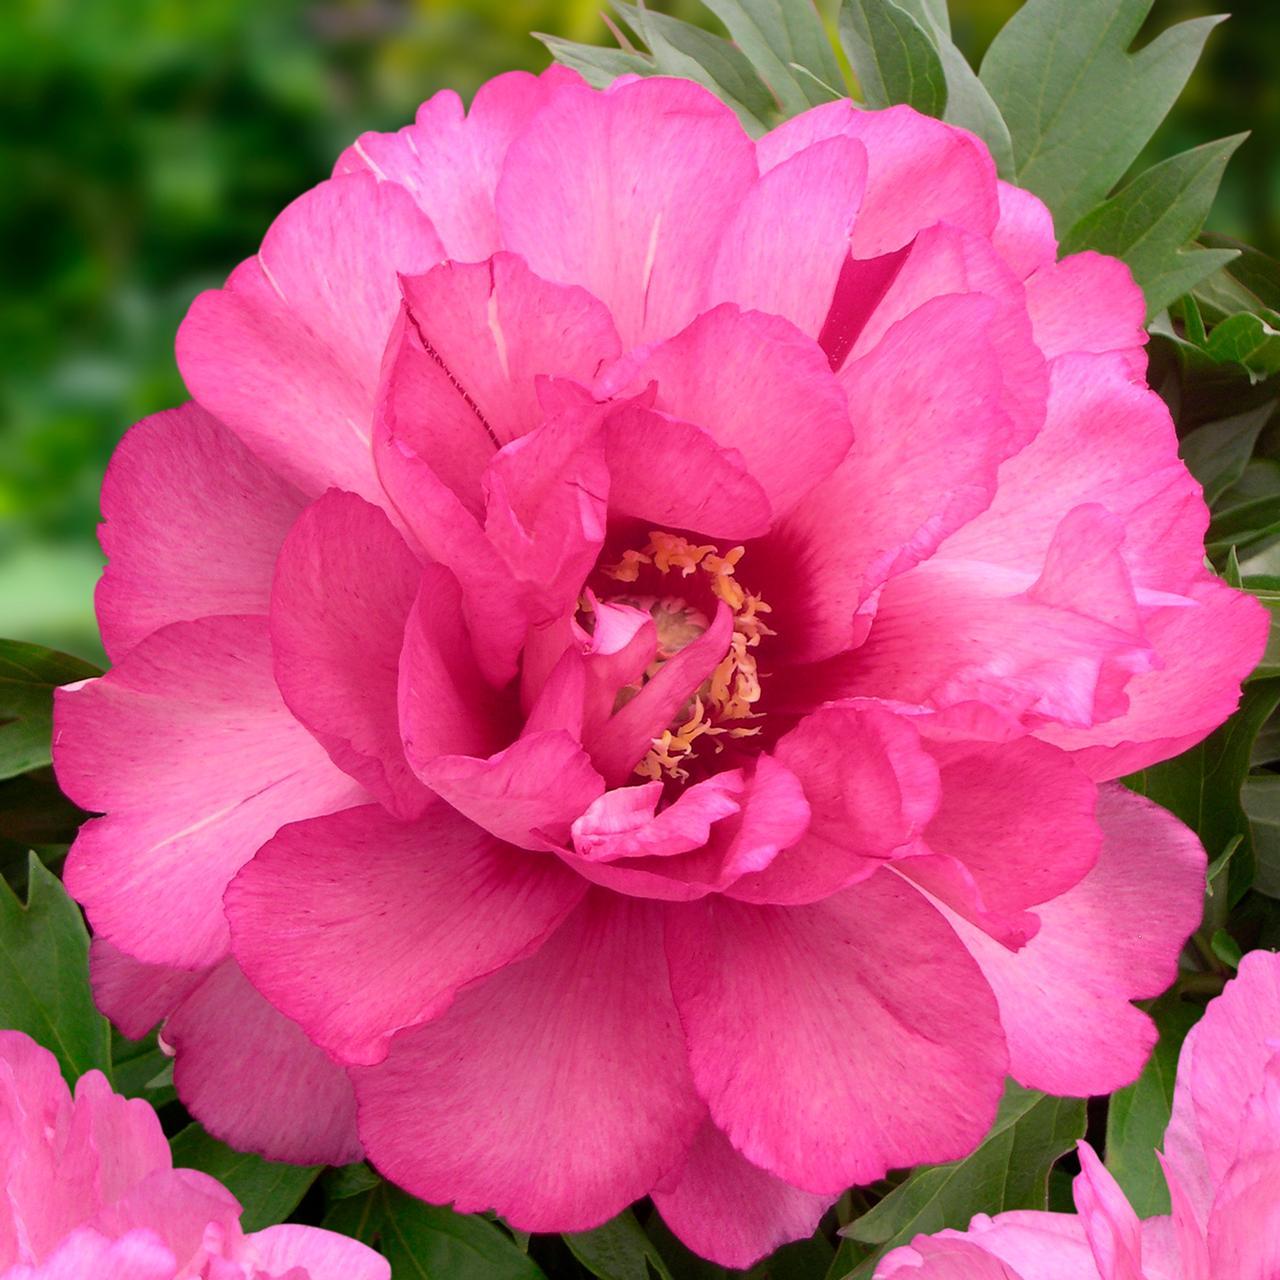 Paeonia itoh 'Julia Rose' (33837)